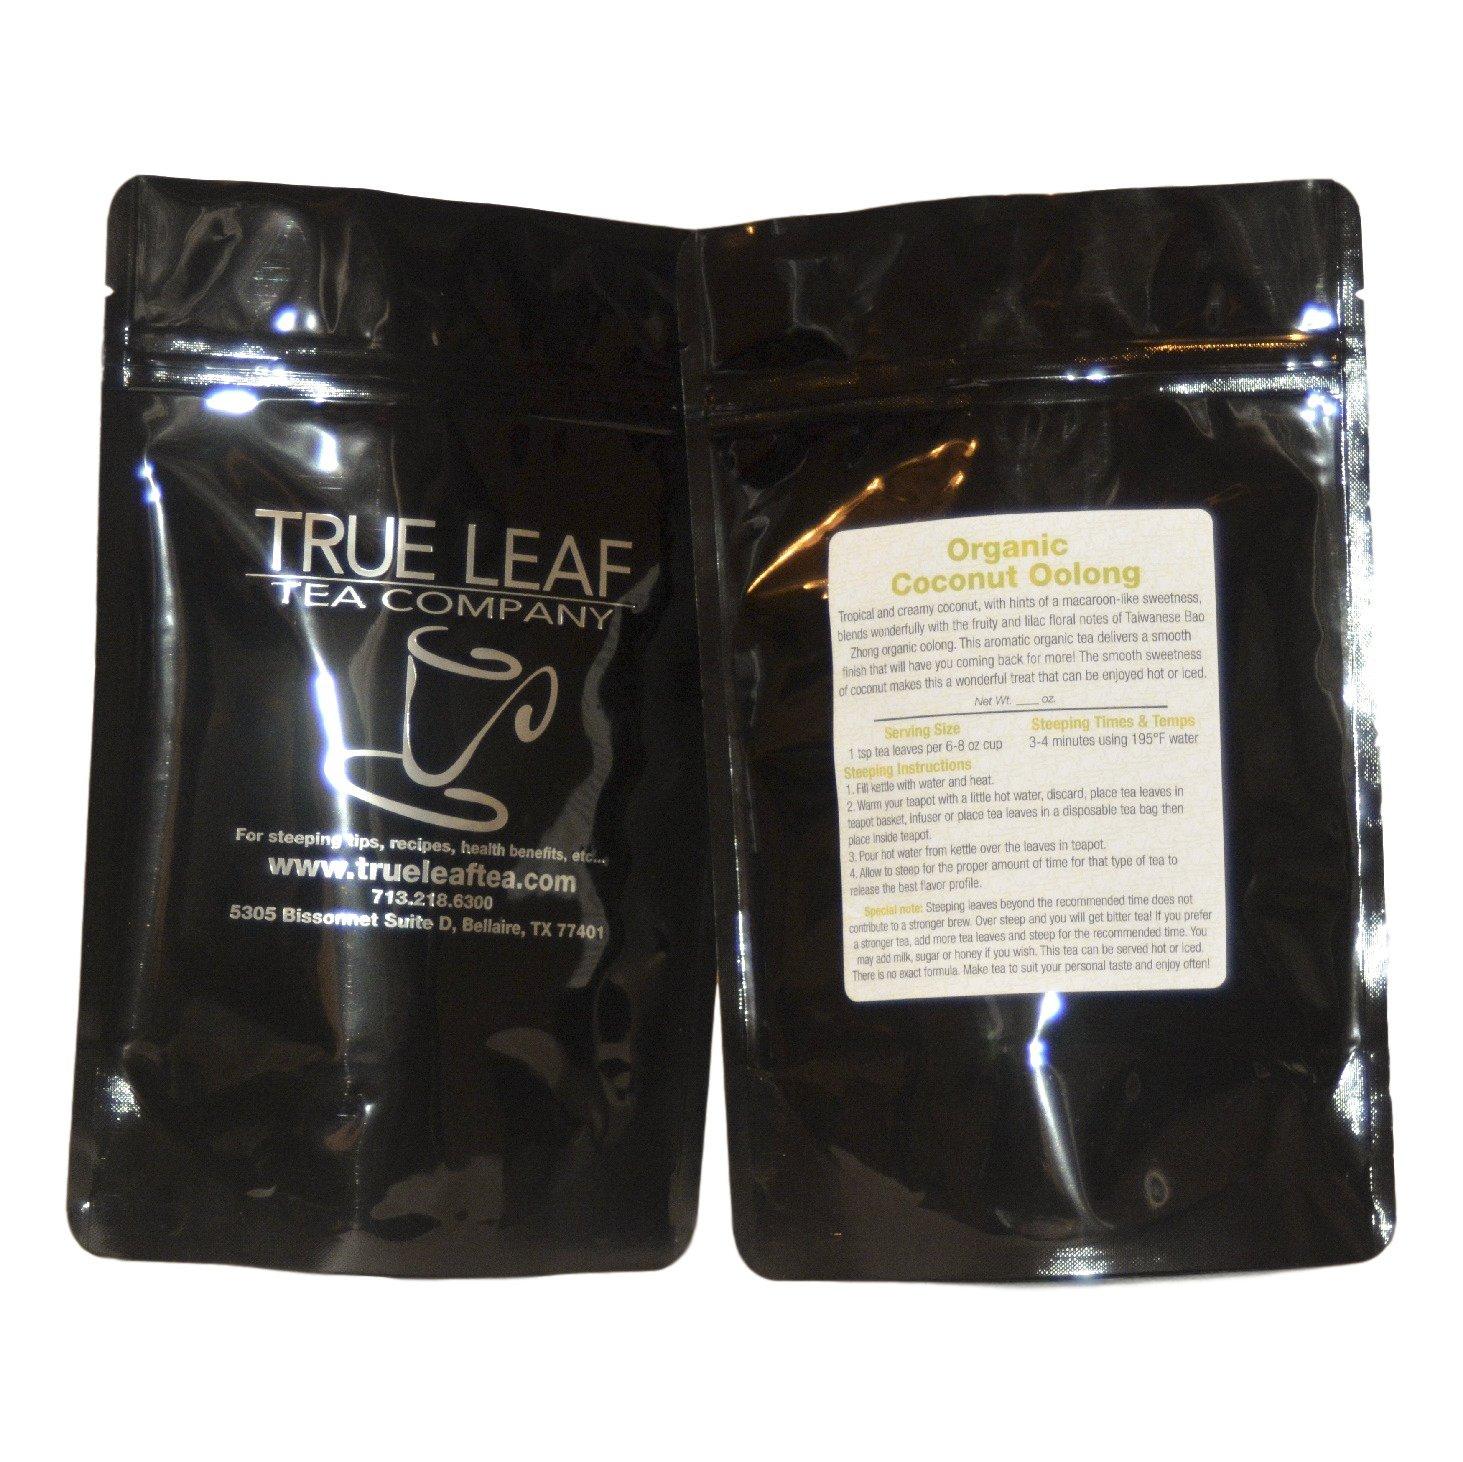 True Leaf Tea Organic Coconut Oolong Tea 2 OZ by True Leaf Tea